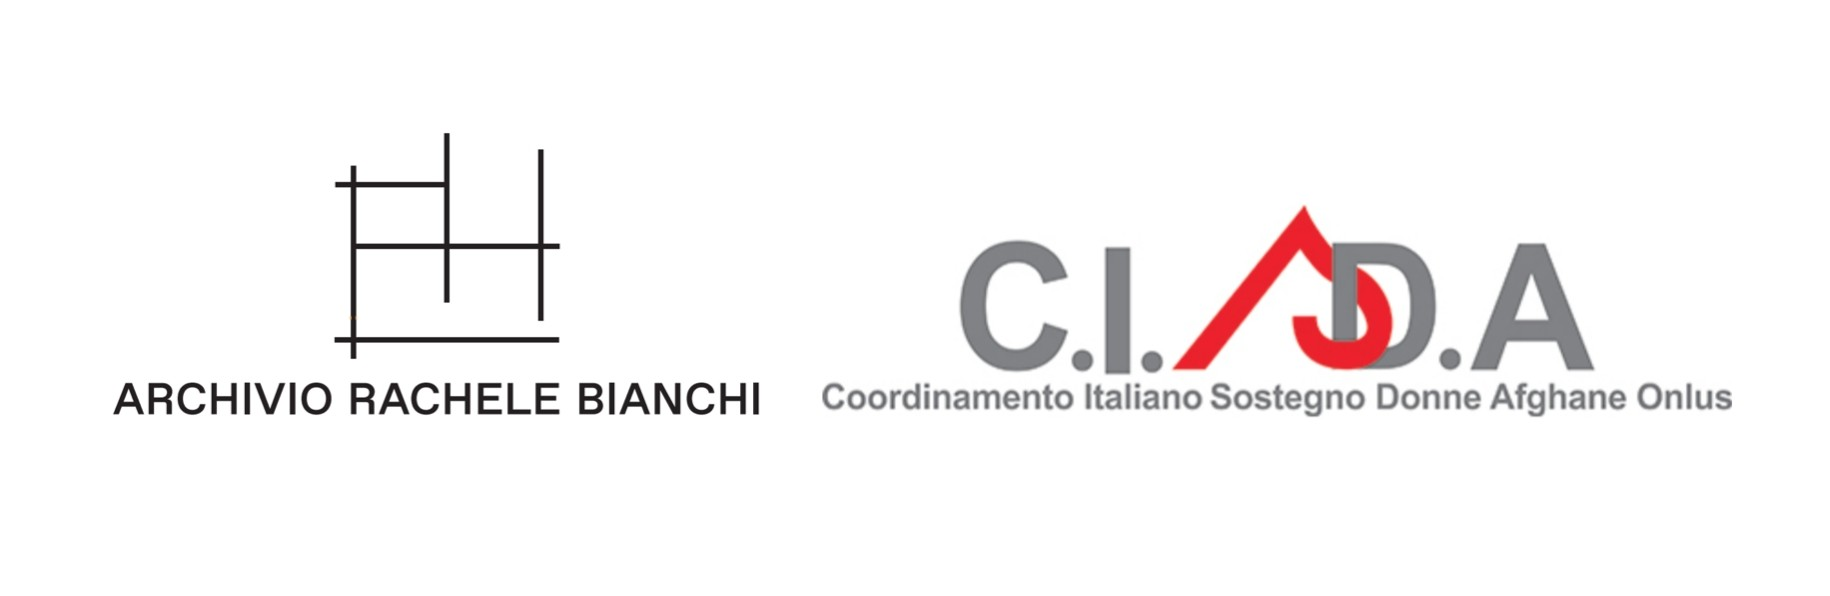 Archivio Rachele Bianchi e CISDA